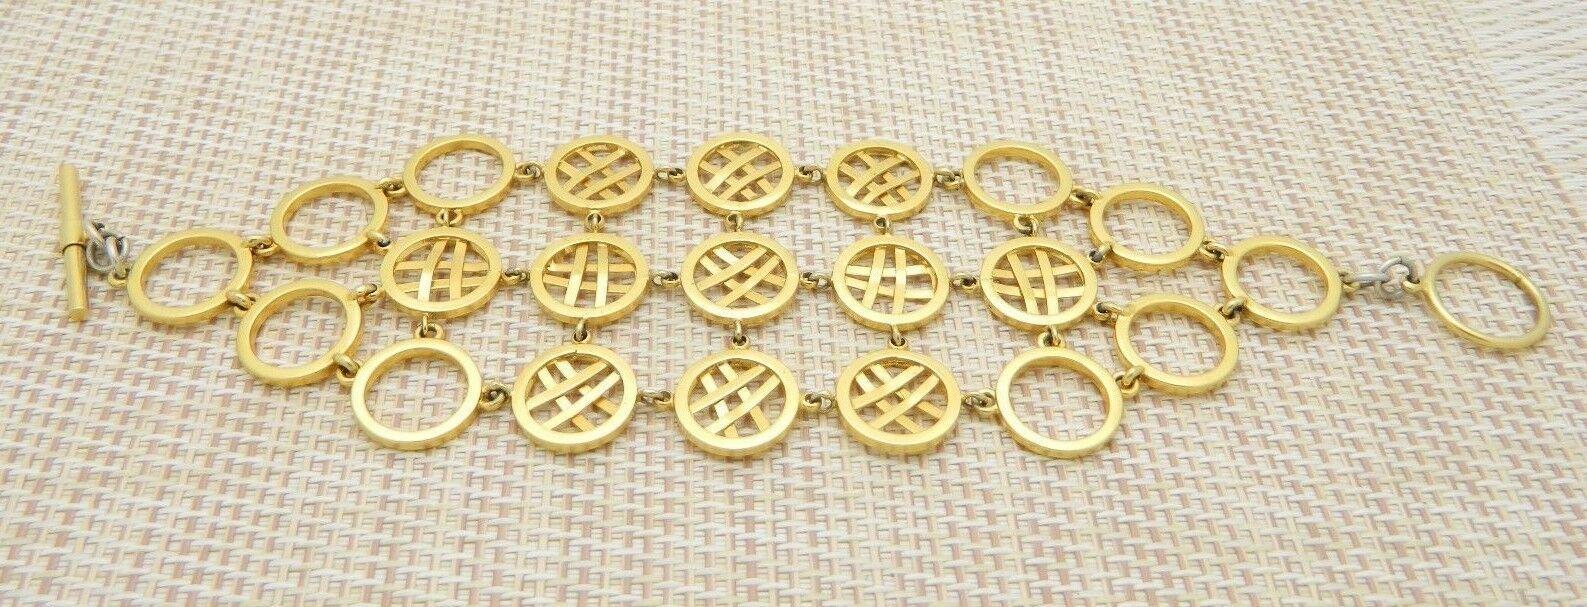 "Circle Cross Hatch Modernist Abstract Gold Tone Bracelet Vintage 7"""